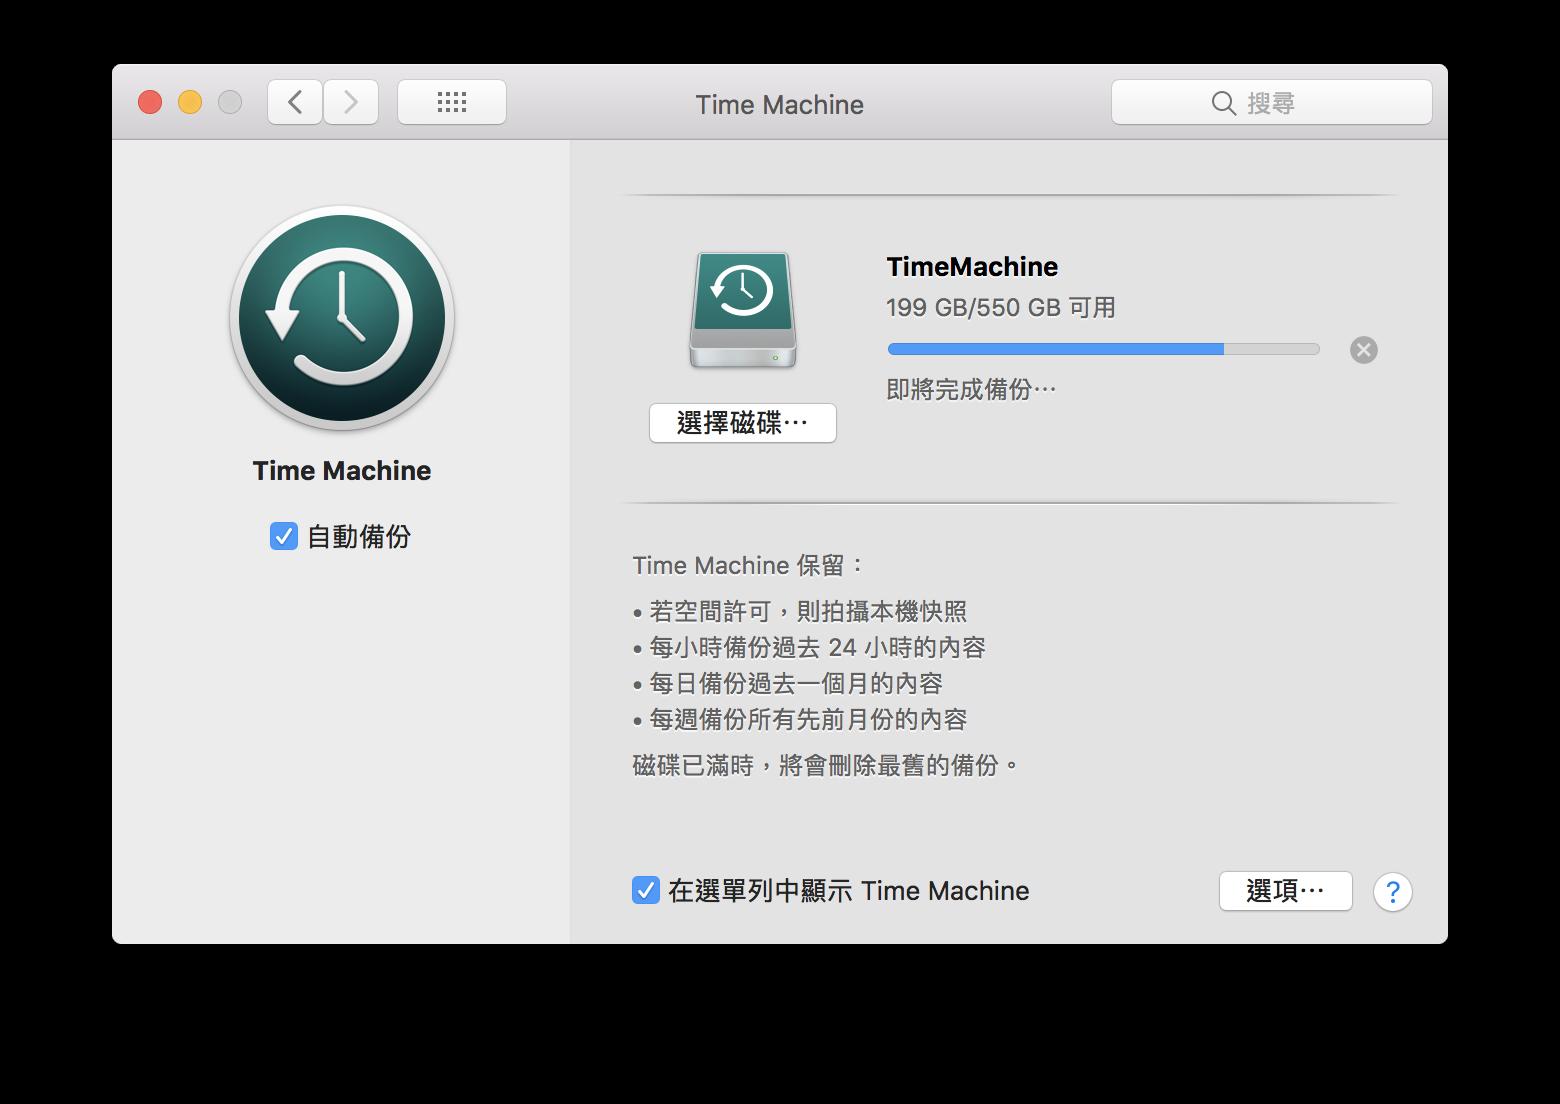 MacBook Pro 鍵盤故障送修過程- TM